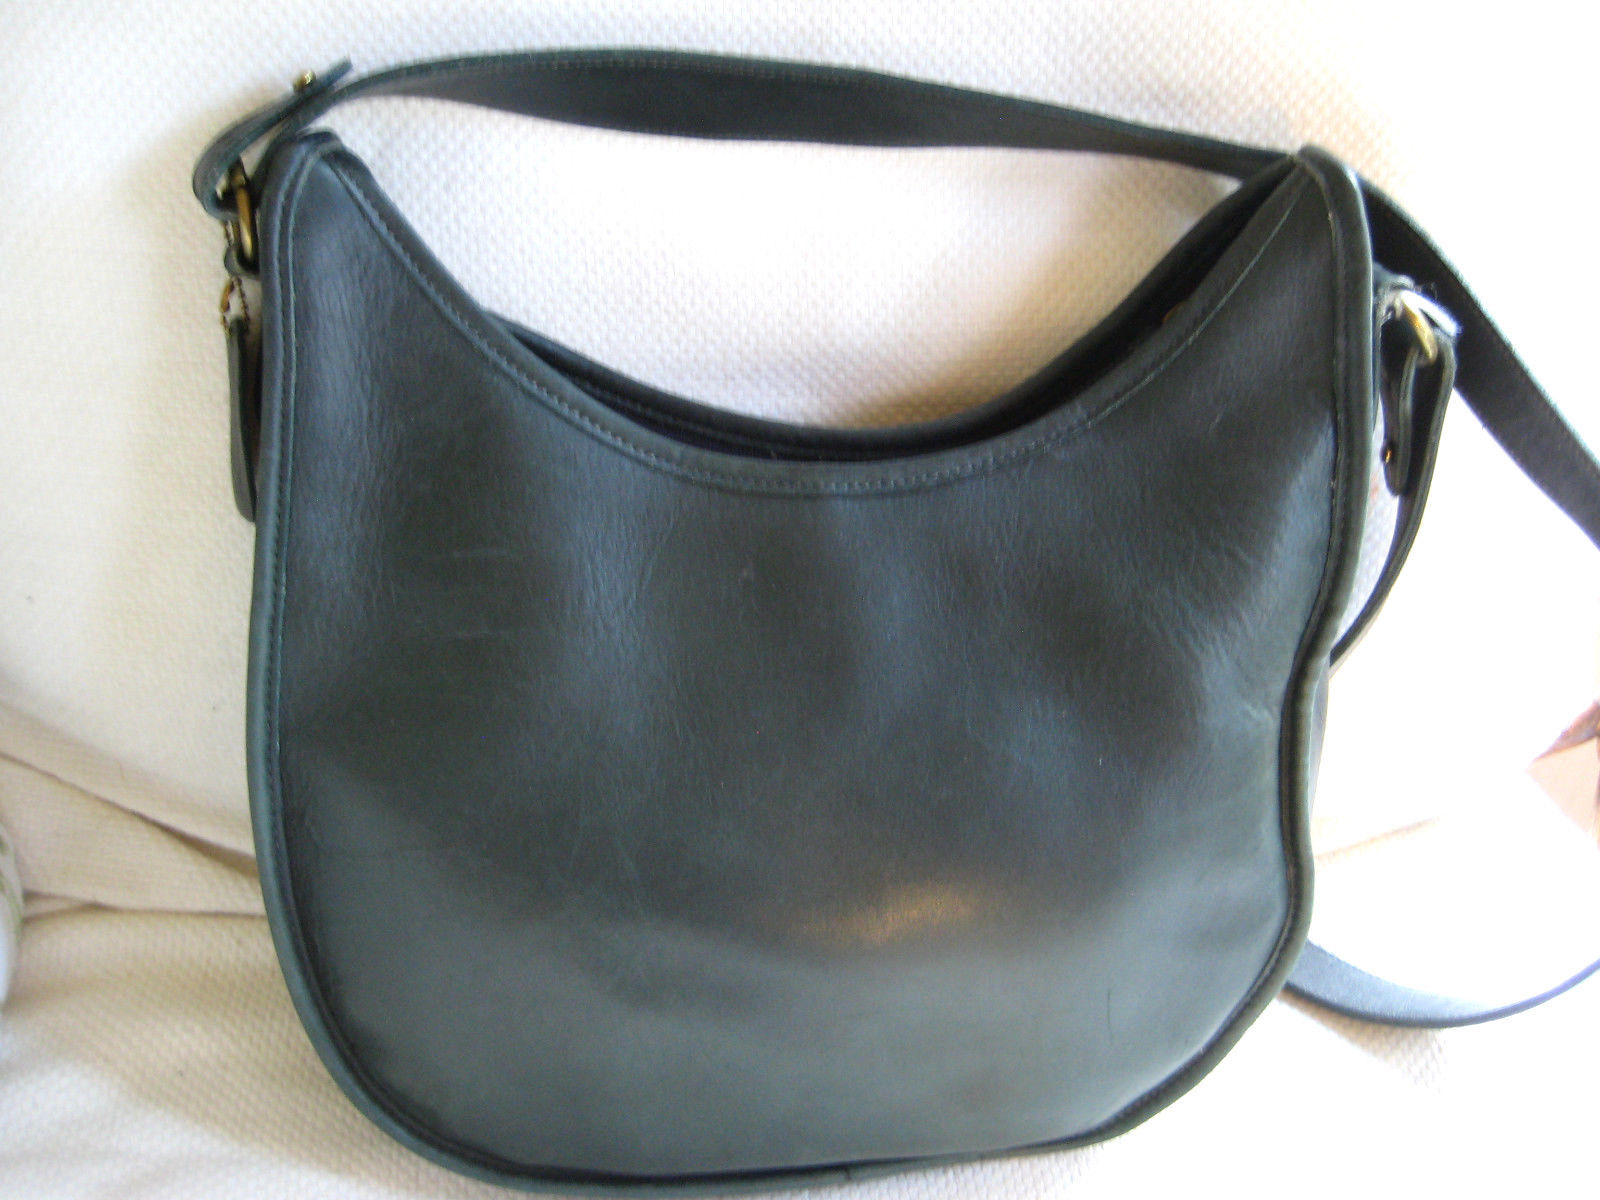 c0ab61a9db77 57. 57. Previous. AUTH COACH 9920 Vintage Beckett Zip Bag Dark Green  Leather Shoulder Bag NICE